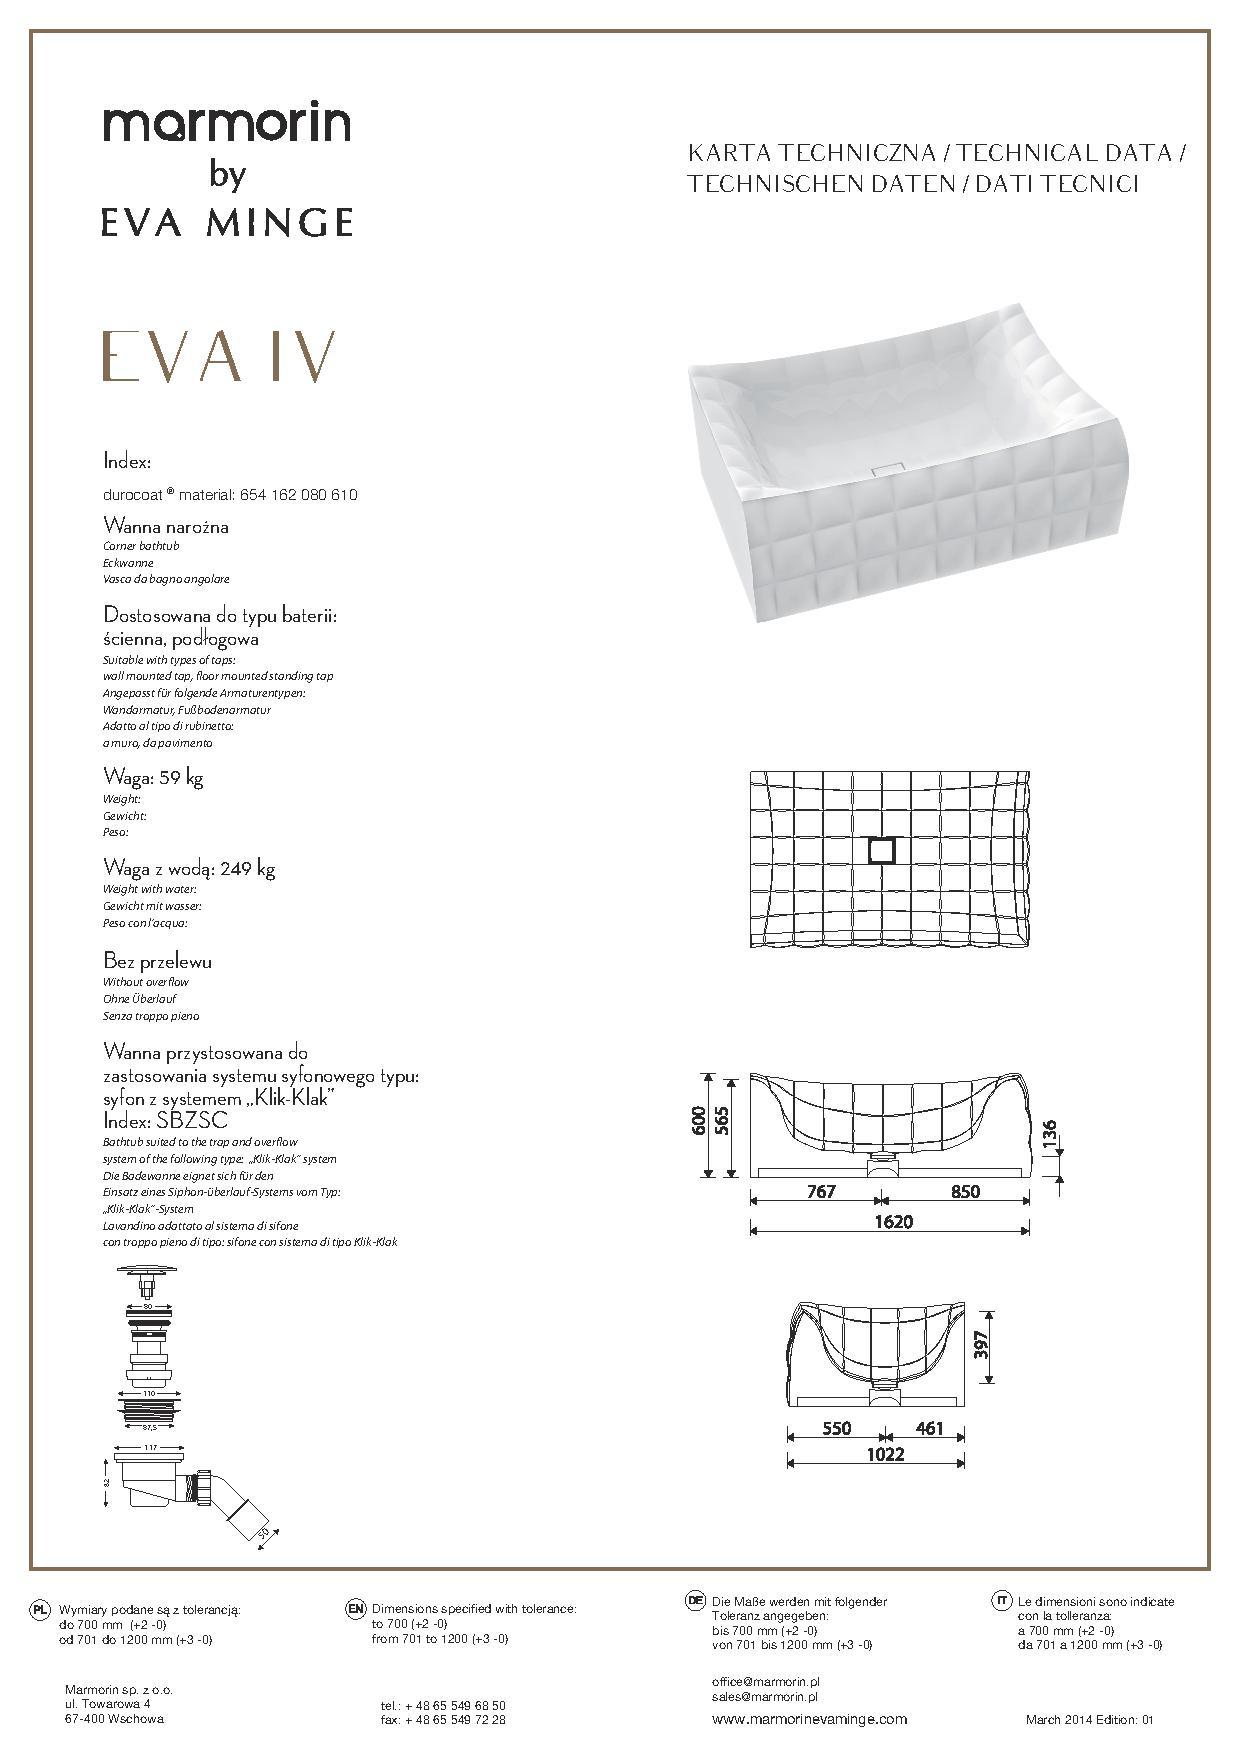 http://www.btmarket.com.ua/img_upl2/karta_techniczna_Eva_IV.jpg